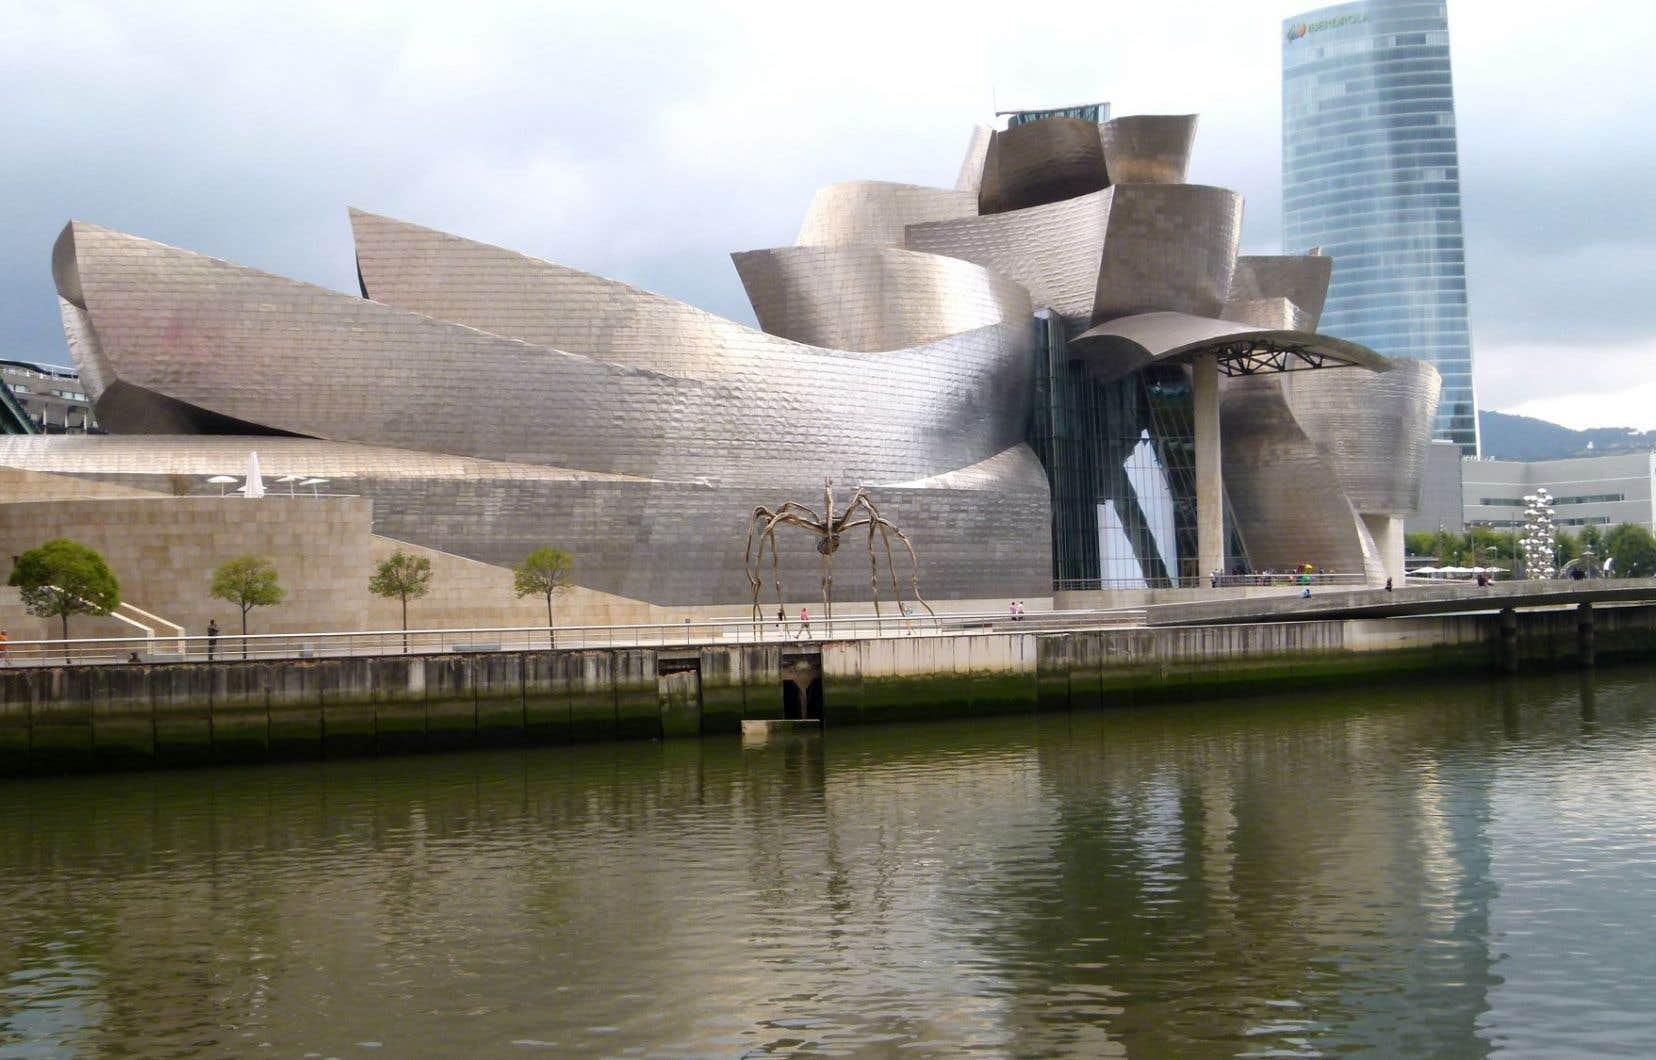 Le musée Guggenheim de Bilbao, au pays basque espagnol, oeuvre phare de Frank Gehry.